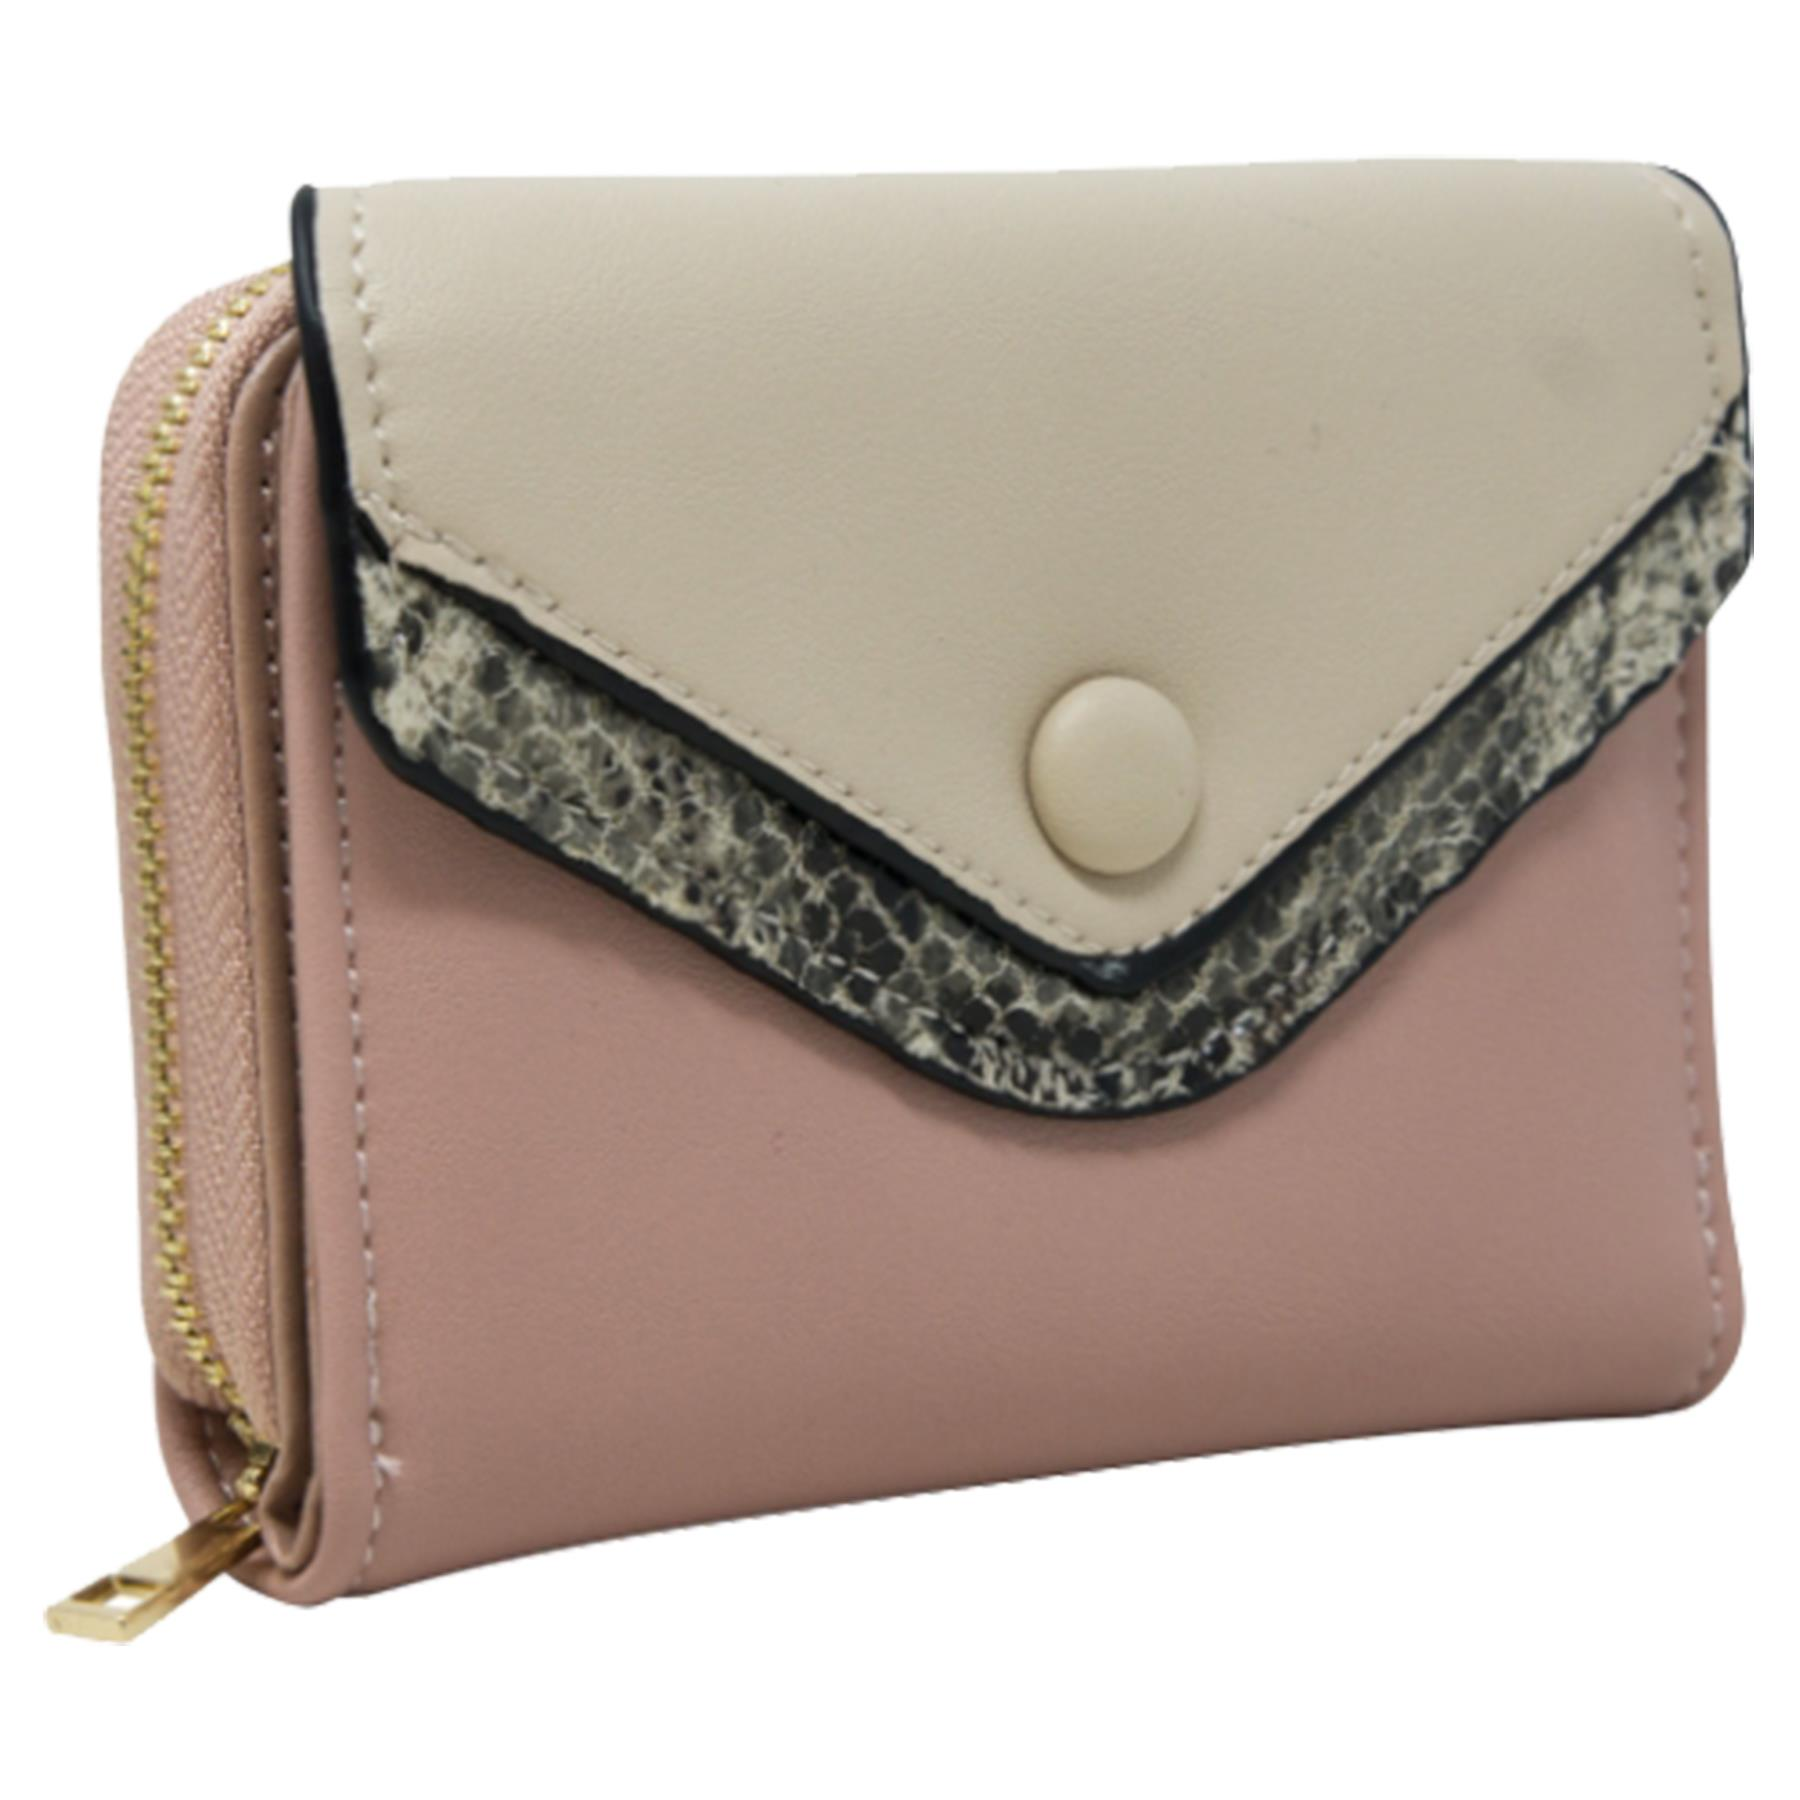 New-Ladies-Multicoloured-Envelope-Faux-Leather-Reptile-Detail-Purse thumbnail 23